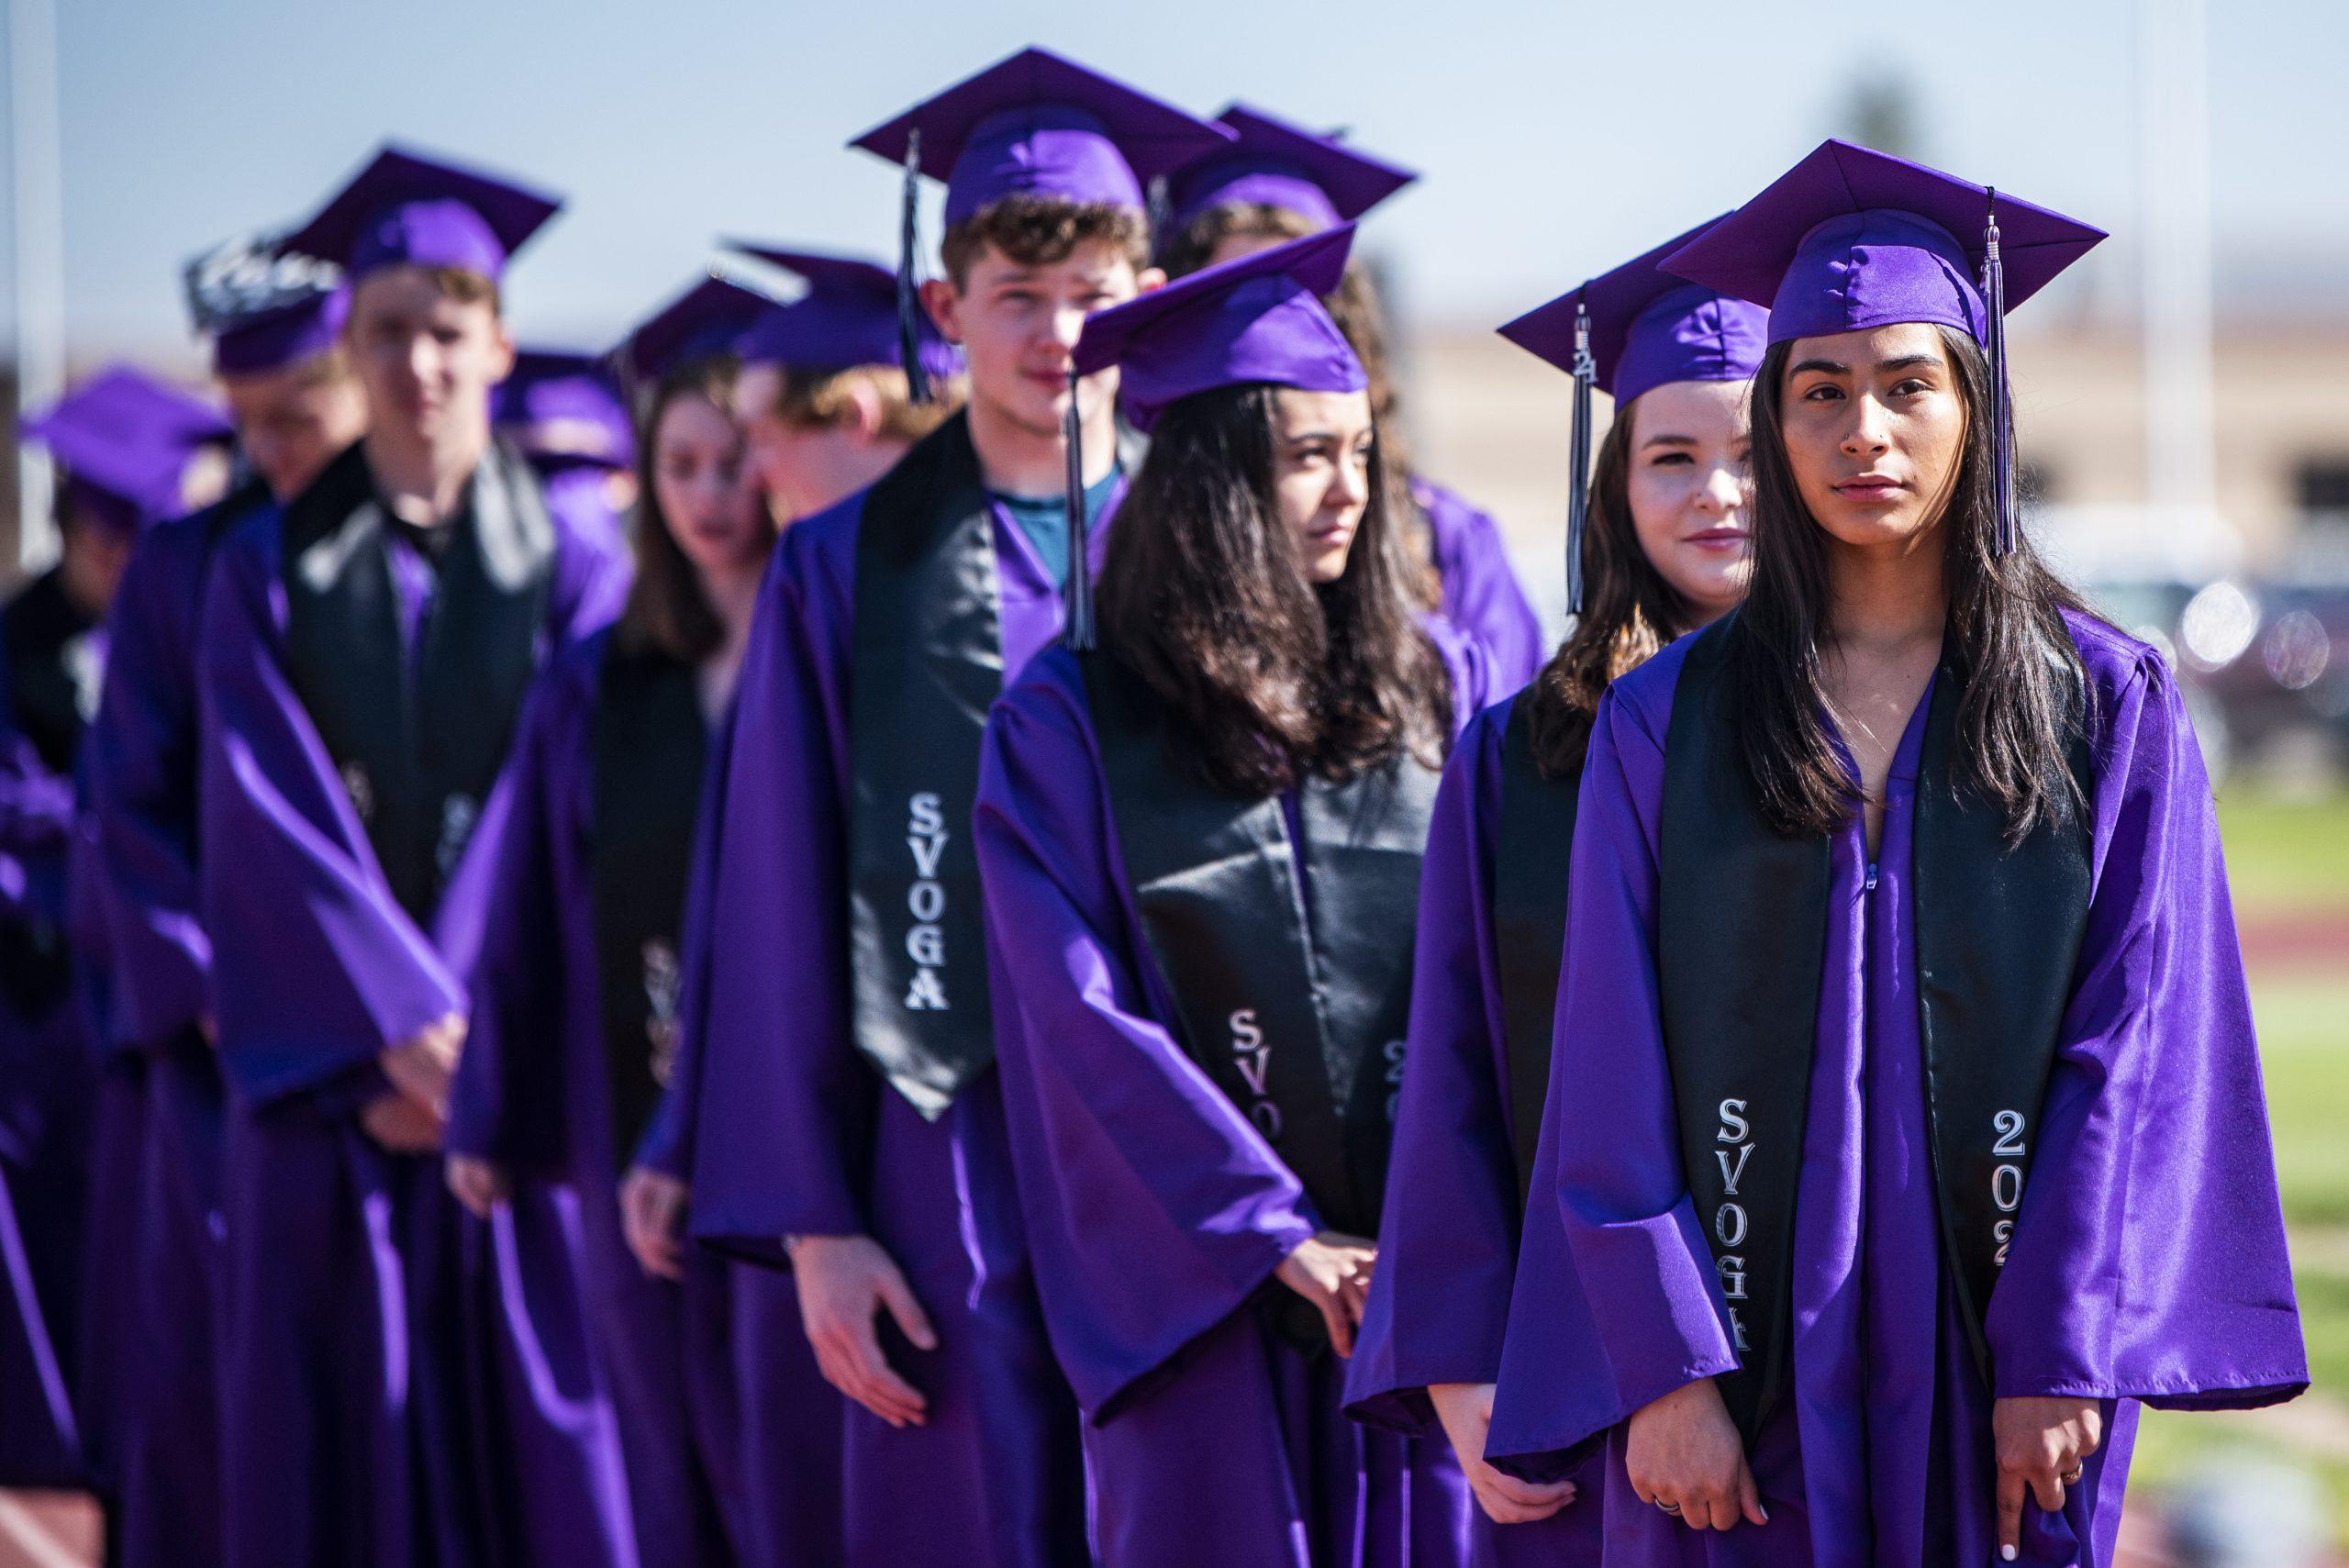 Graduates lined up preparing to receive diplomas